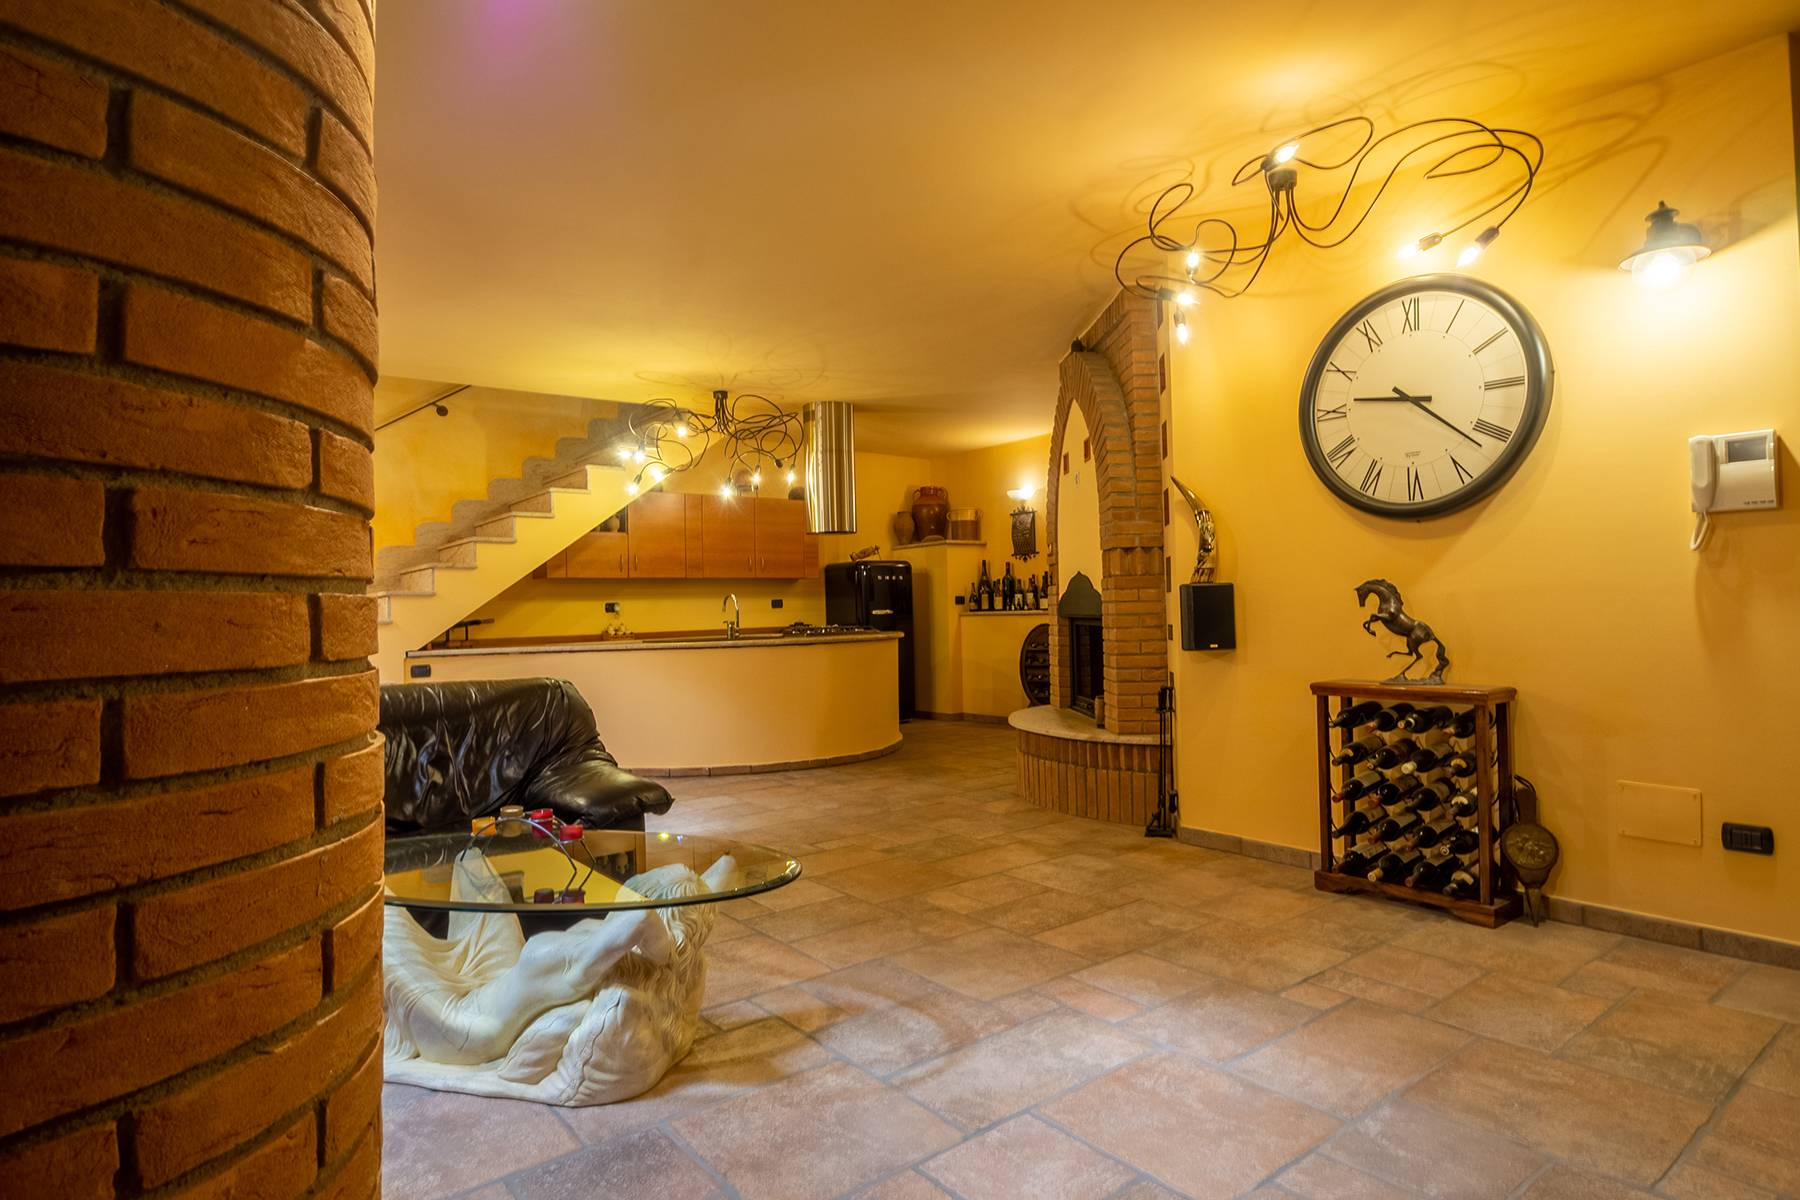 Villa in Vendita a Rosta: 5 locali, 182 mq - Foto 24